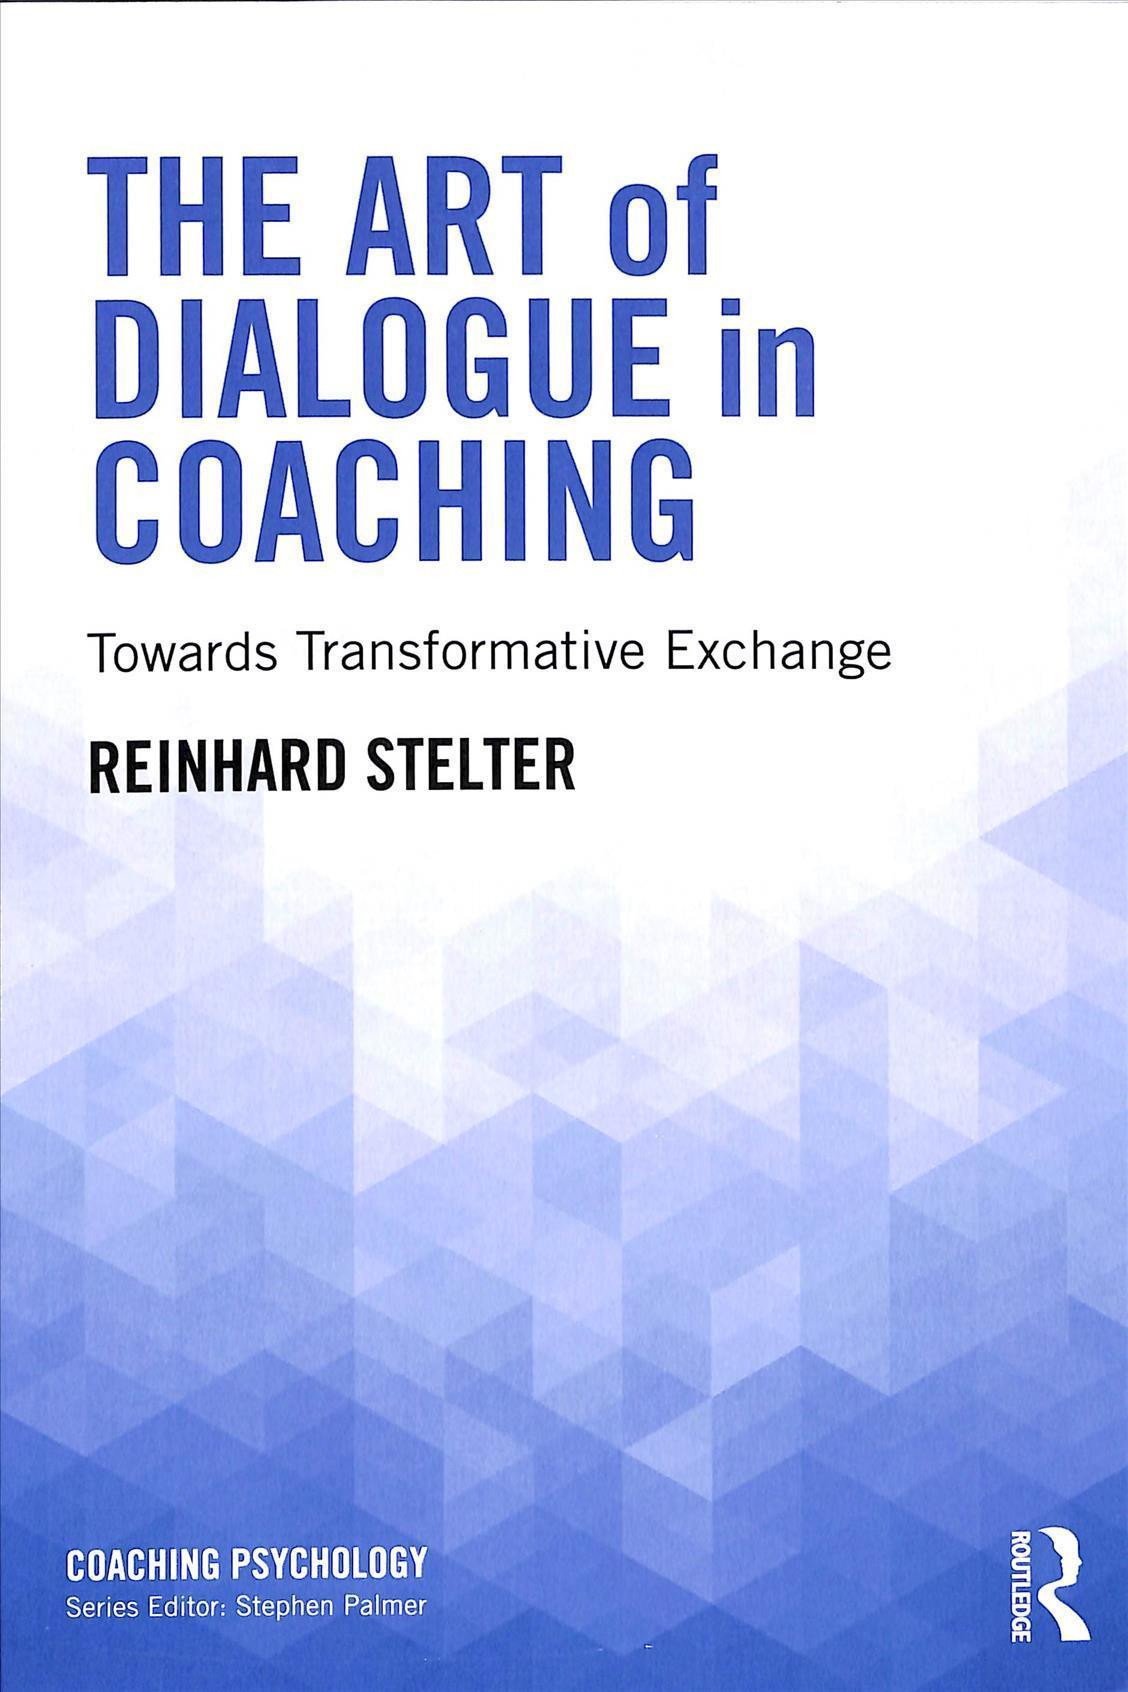 The art of dialogue in coaching reinhard stelter 9781138543553